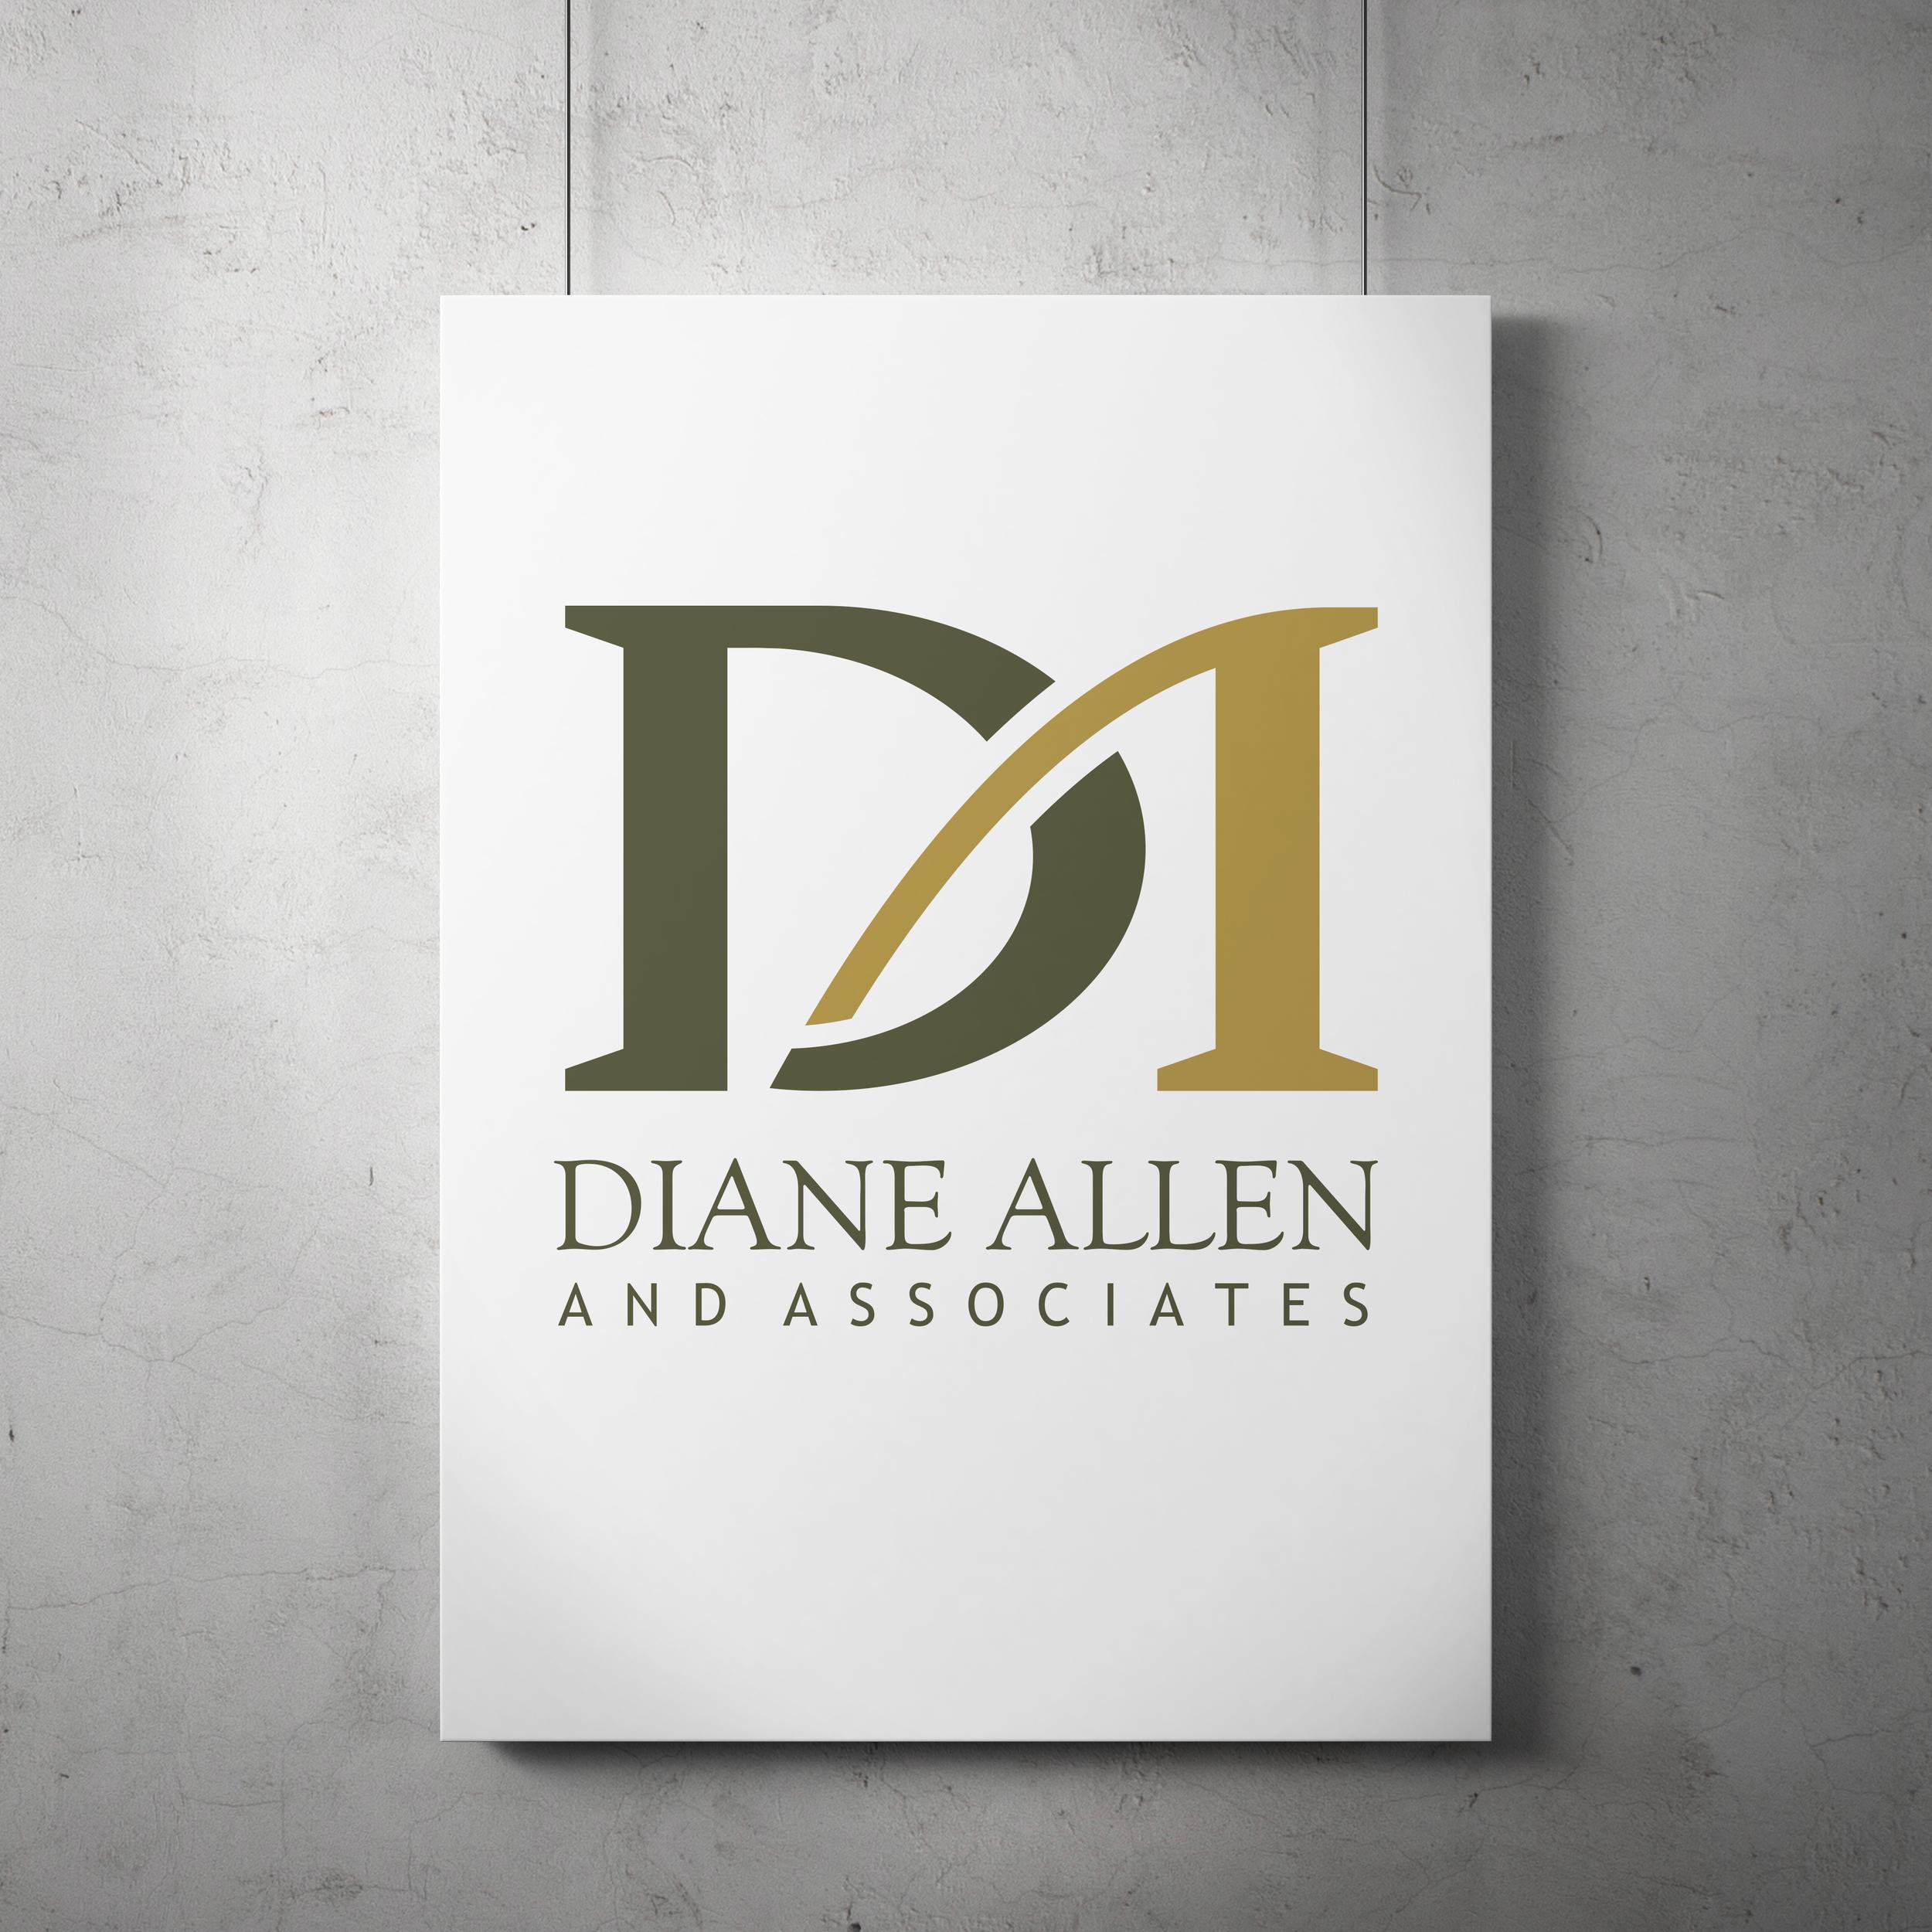 Logo design for Diane Allen and Associates